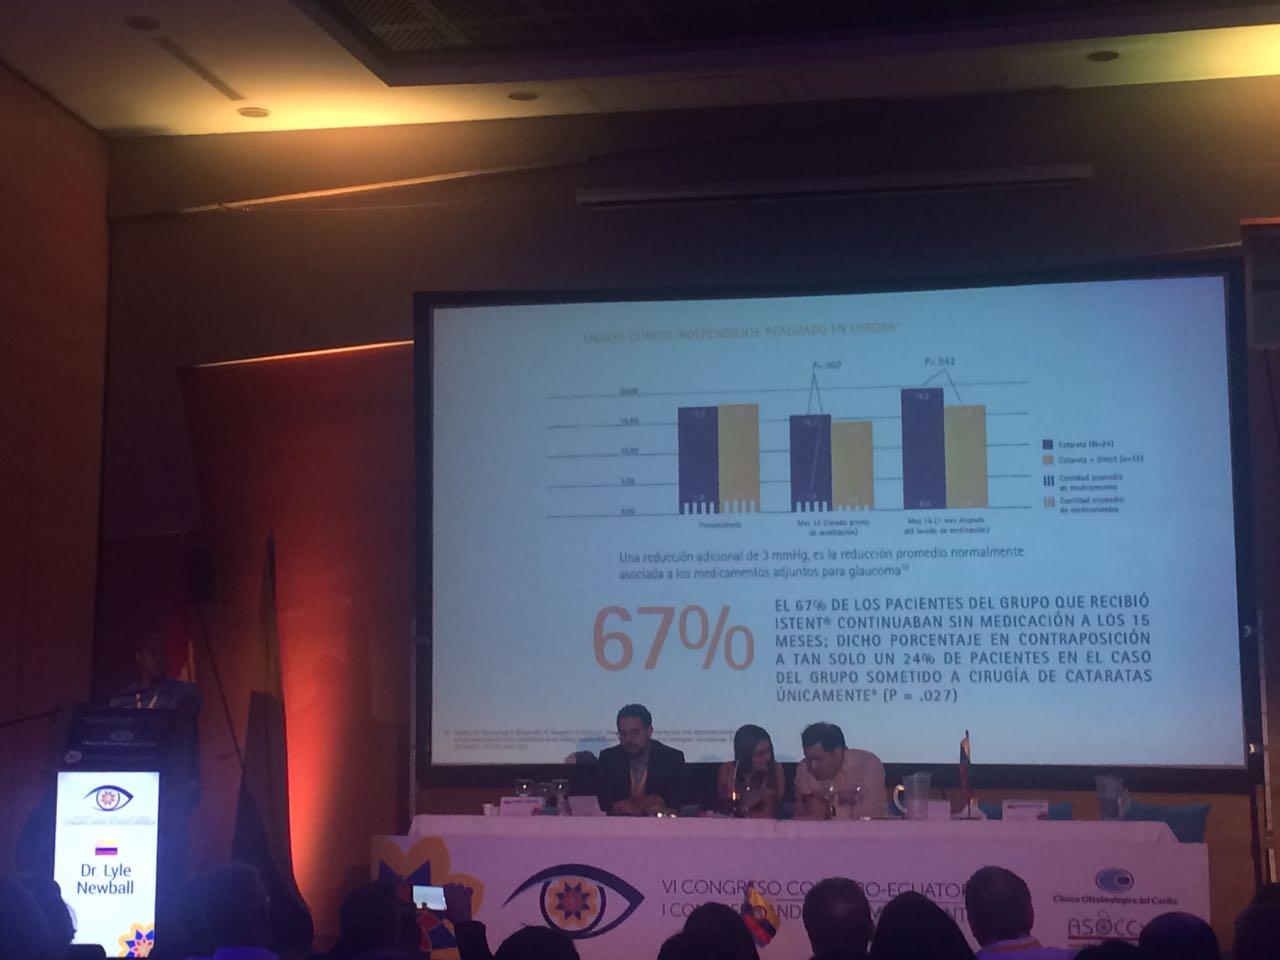 I Congreso Andino de Segmento Anterior y VI Congreso Colombo Ecuatoriano de Catarata y Segmento anterior 2017